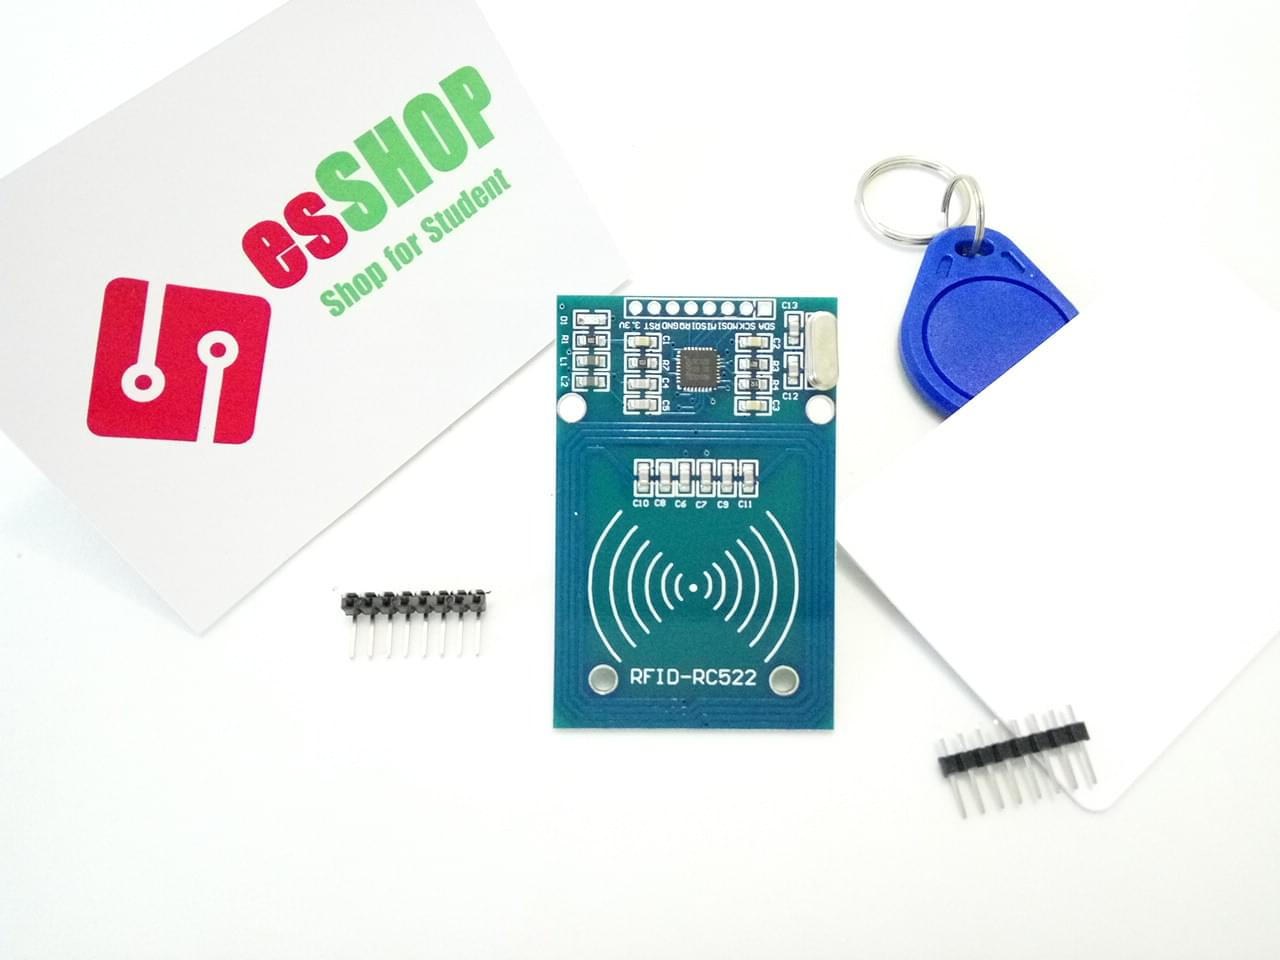 B0237 - Board RFID NFC MFRC-522 + Thẻ từ + Tag từ